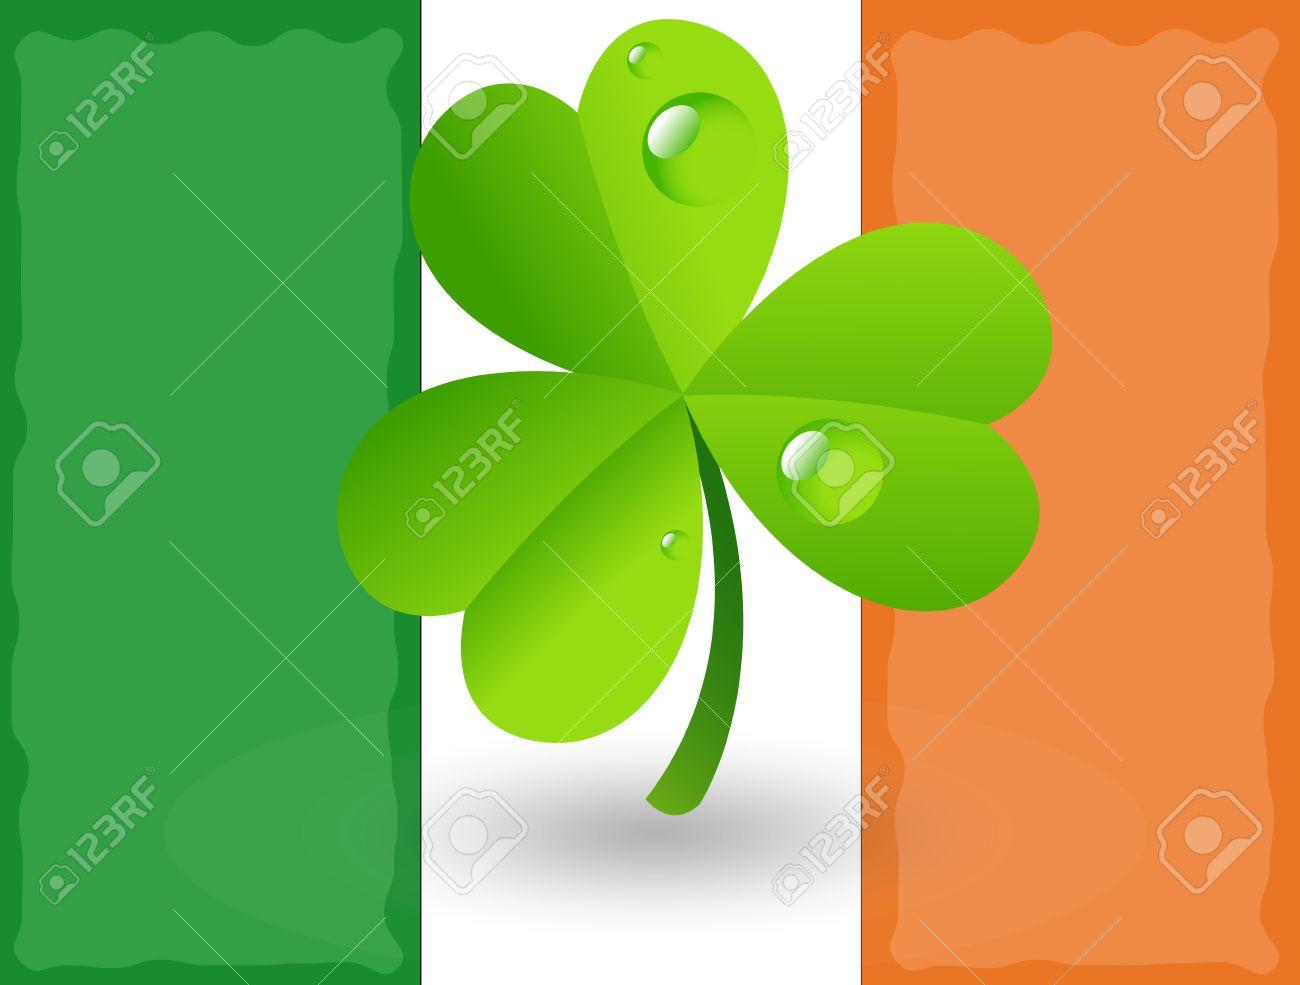 shamrock on irish flag background royalty free cliparts vectors